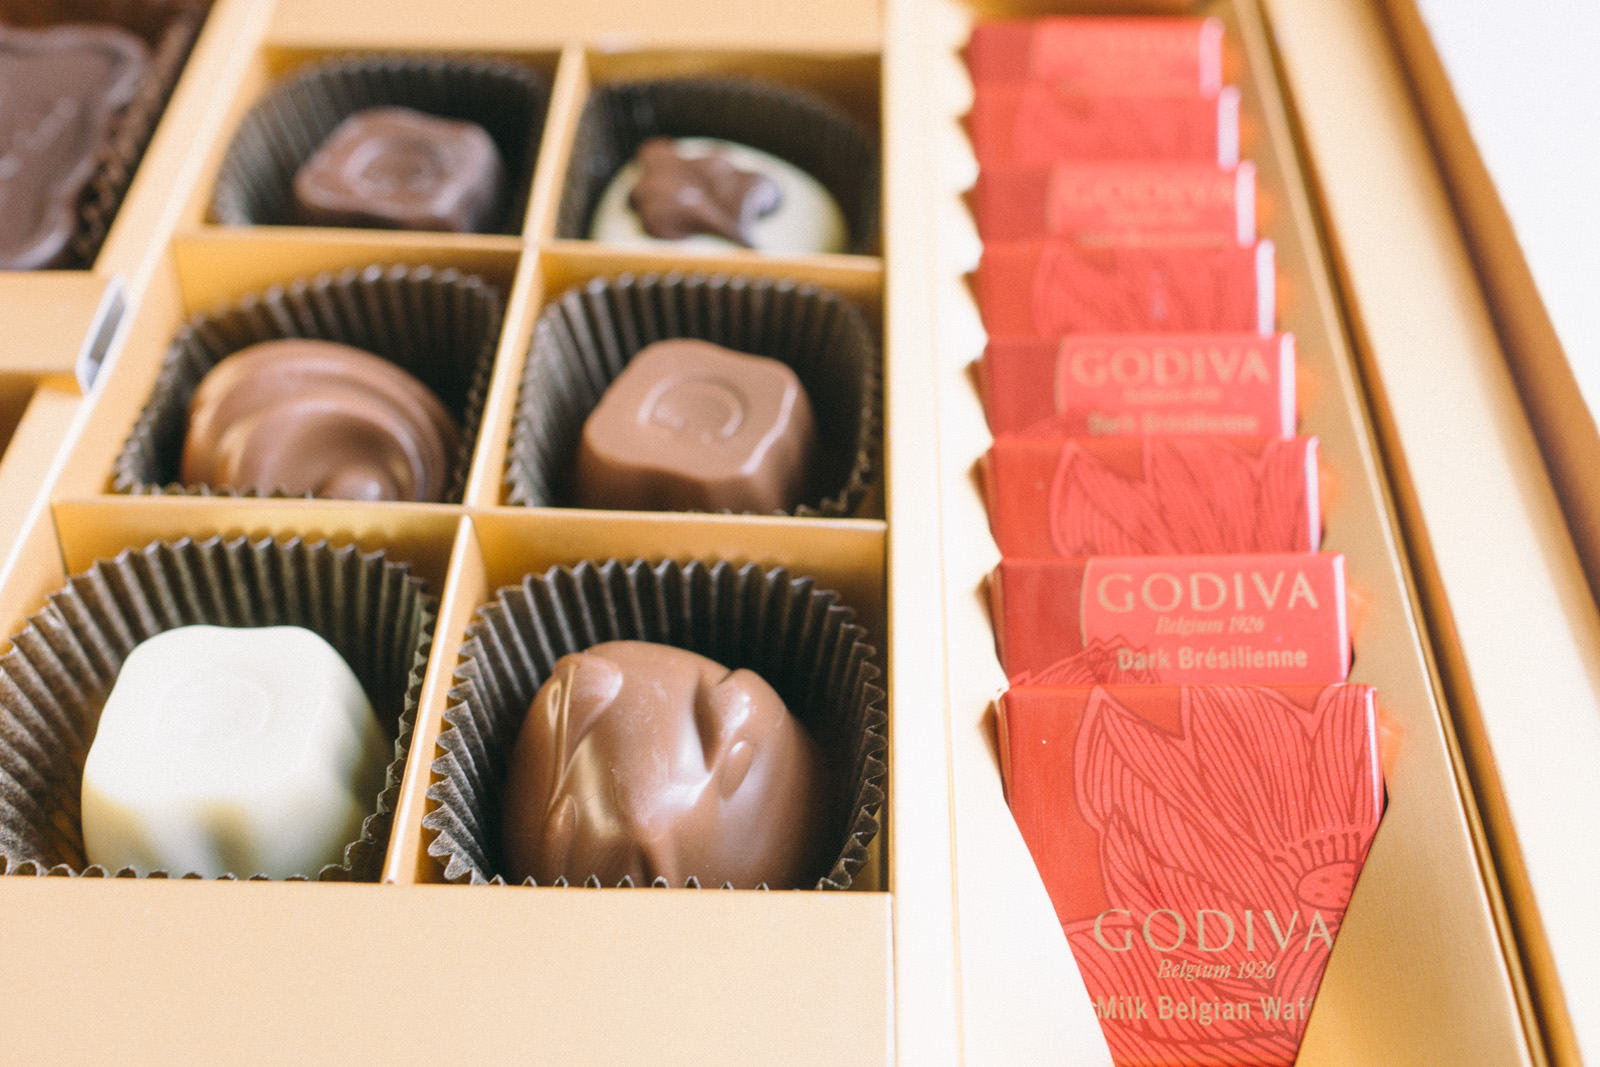 that-food-cray-godiva-chocolate-2013-mid-autumn-festival-mooncakes-28